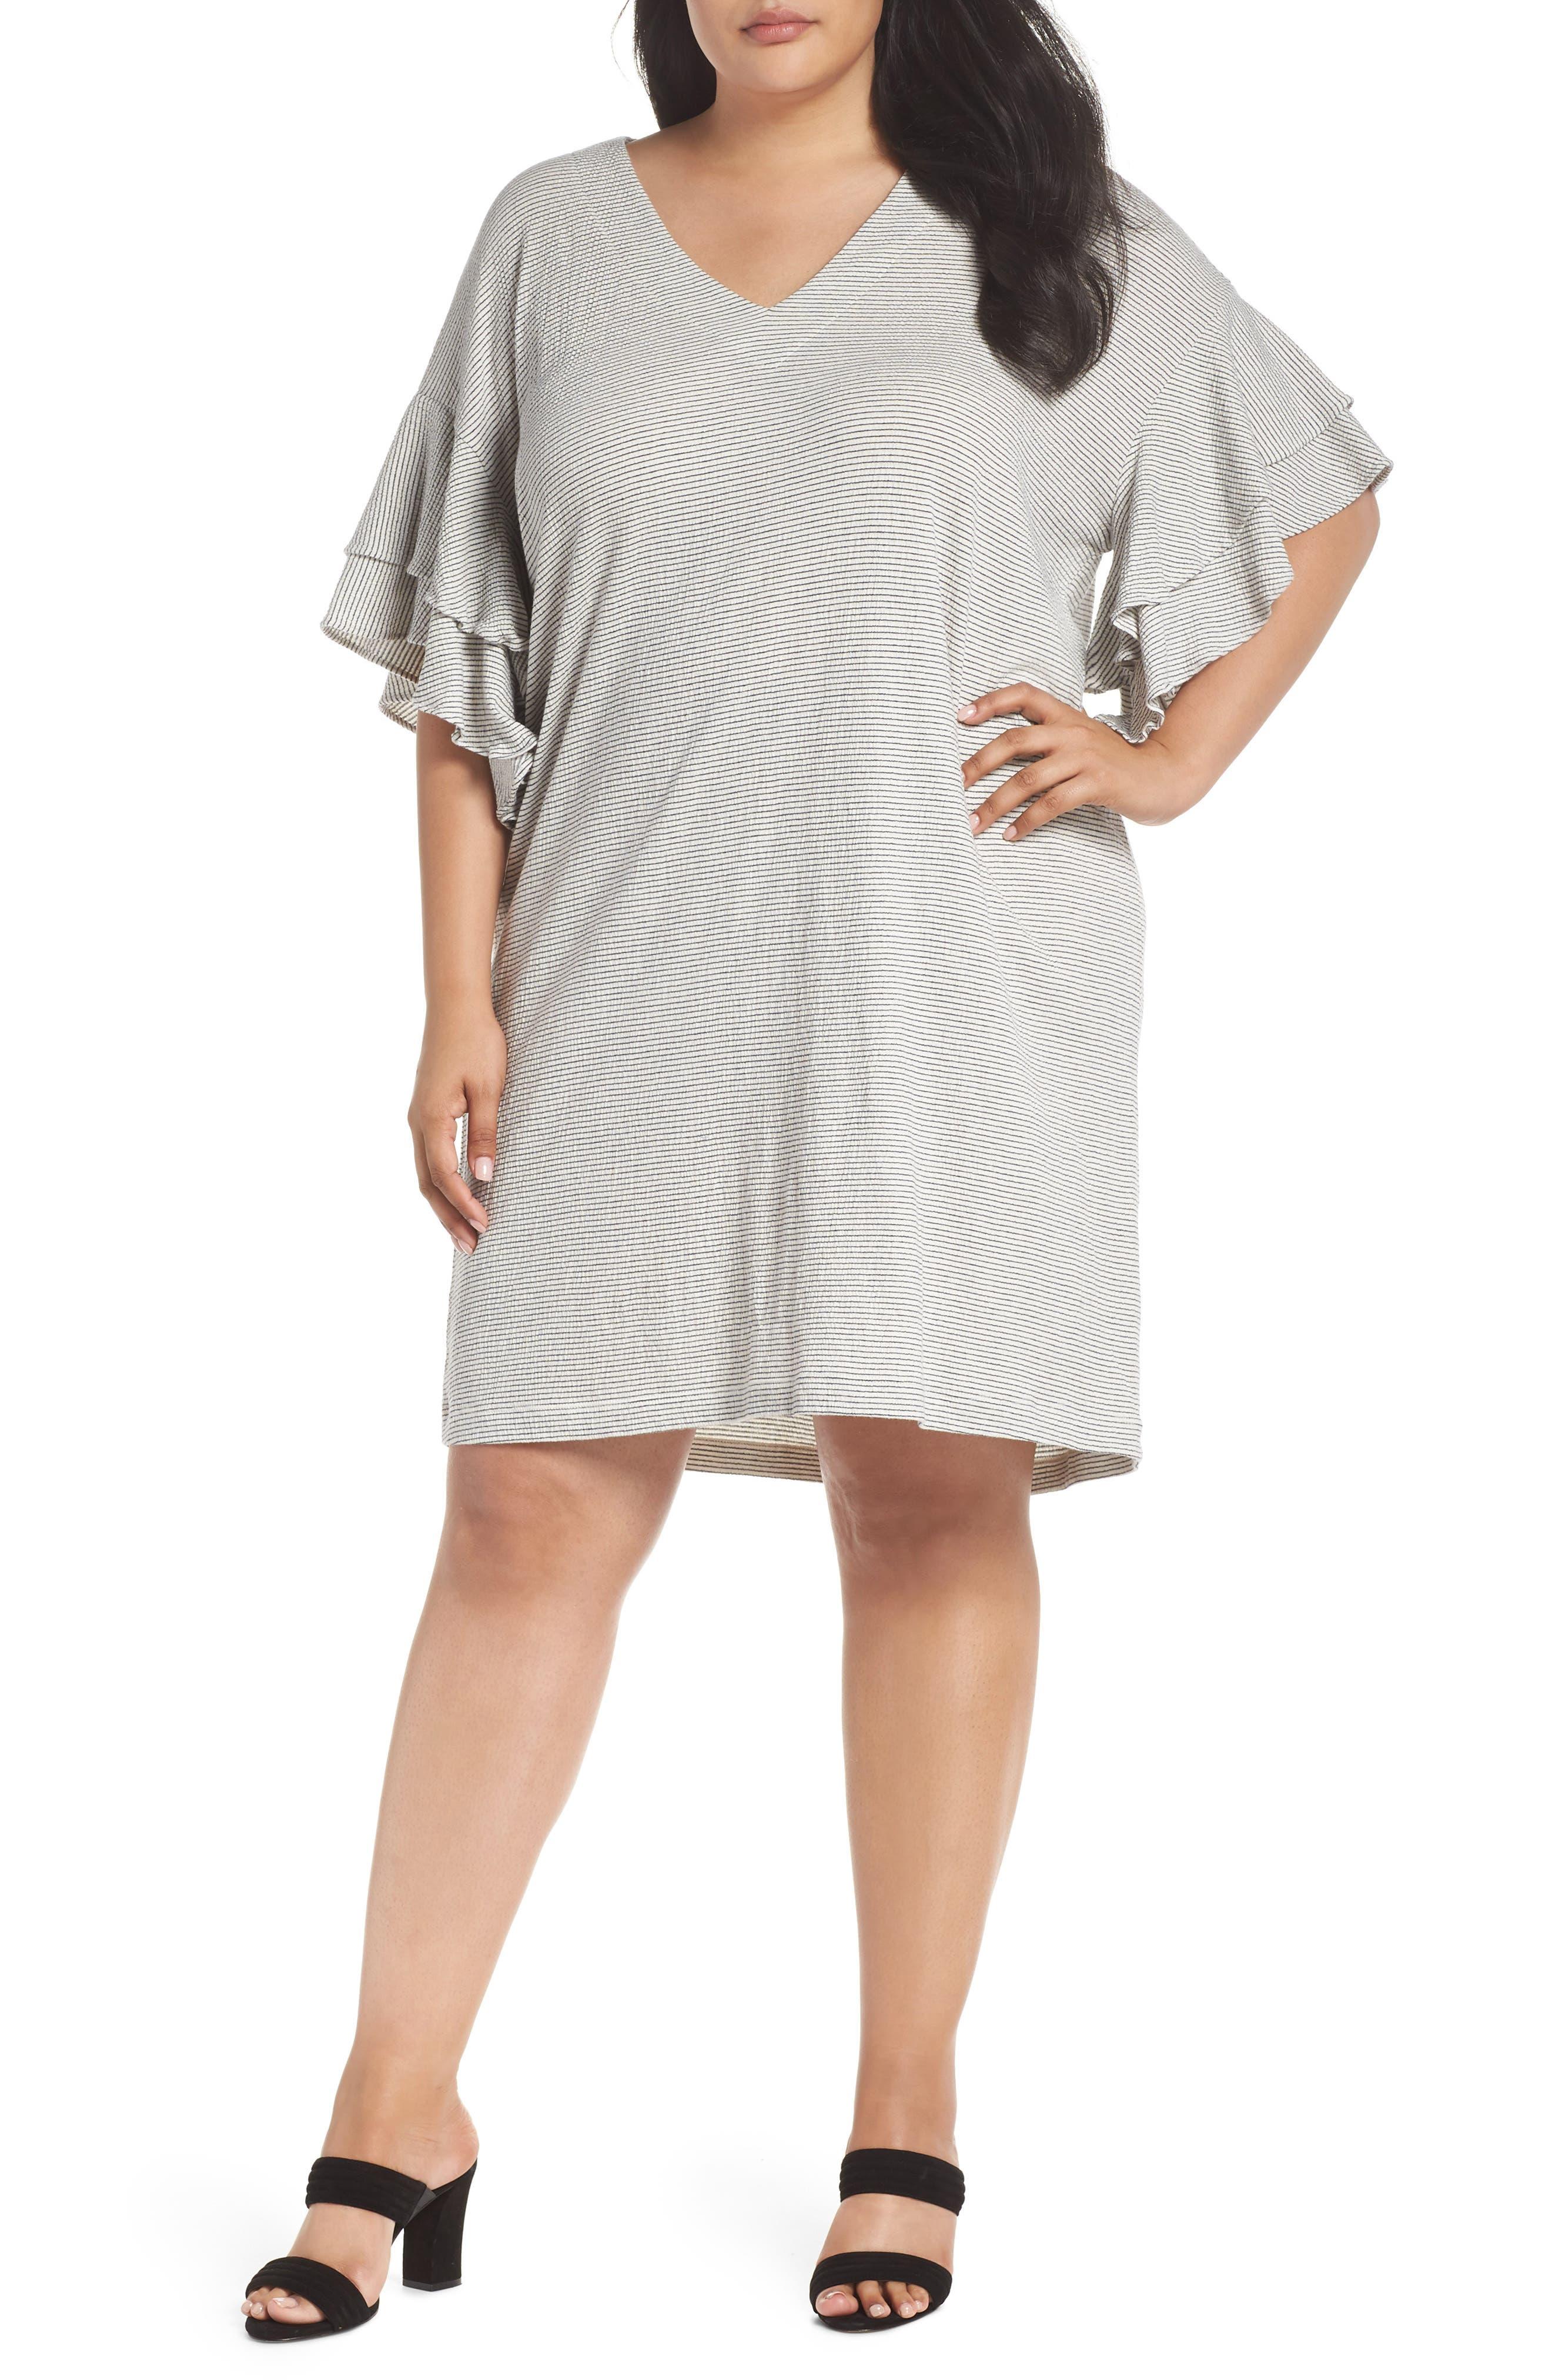 Alternate Image 1 Selected - Lucky Brand Stripe Ruffle Minidress (Plus Size)